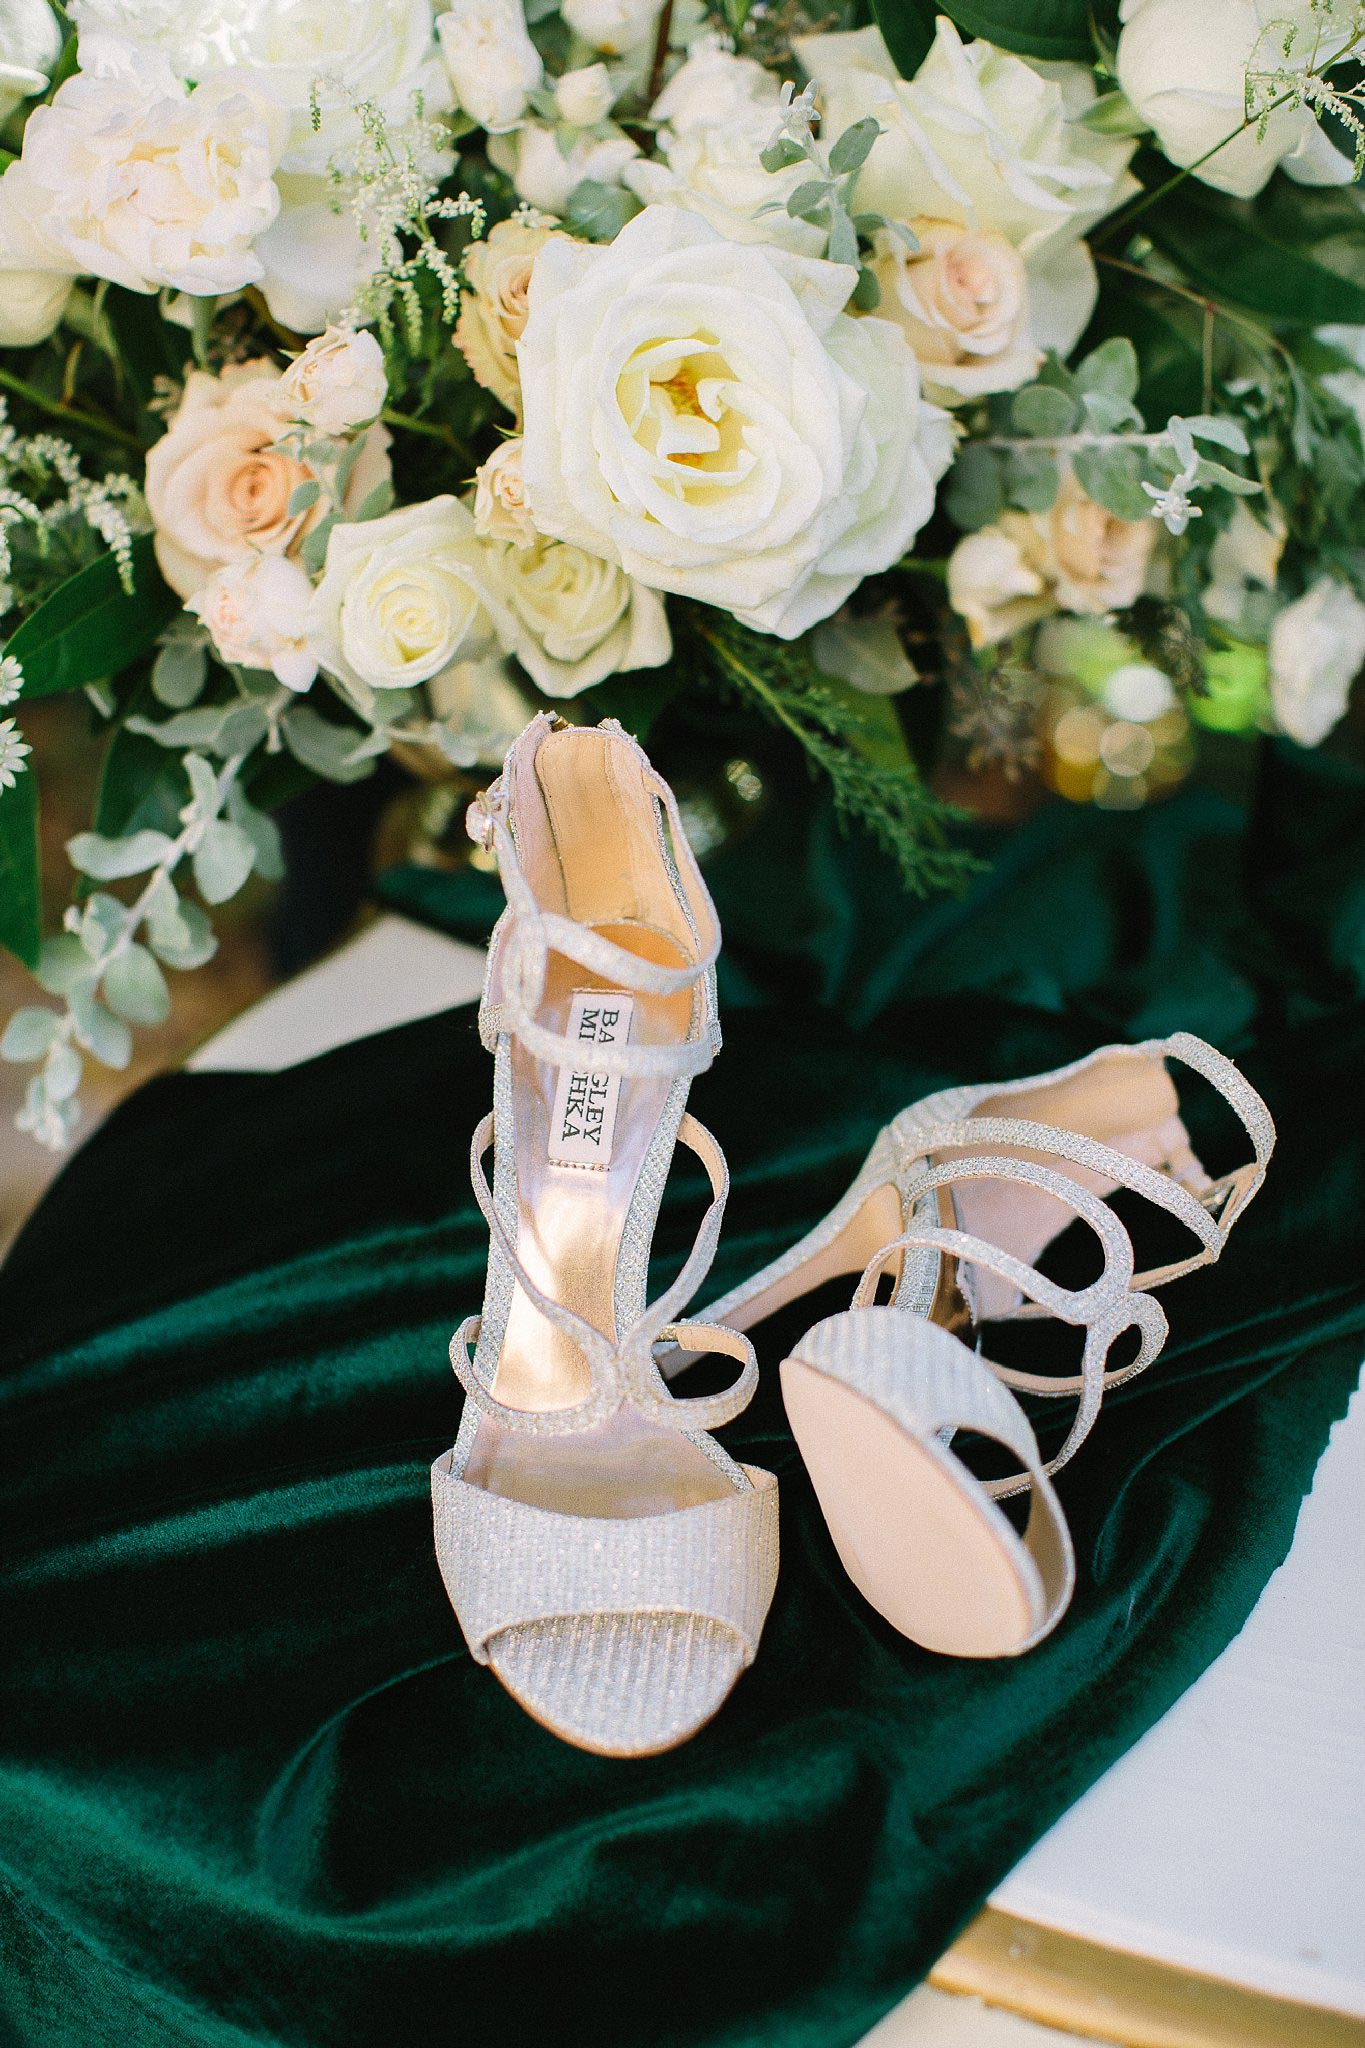 aristide mansfield wedding shoes on velvet green fabric